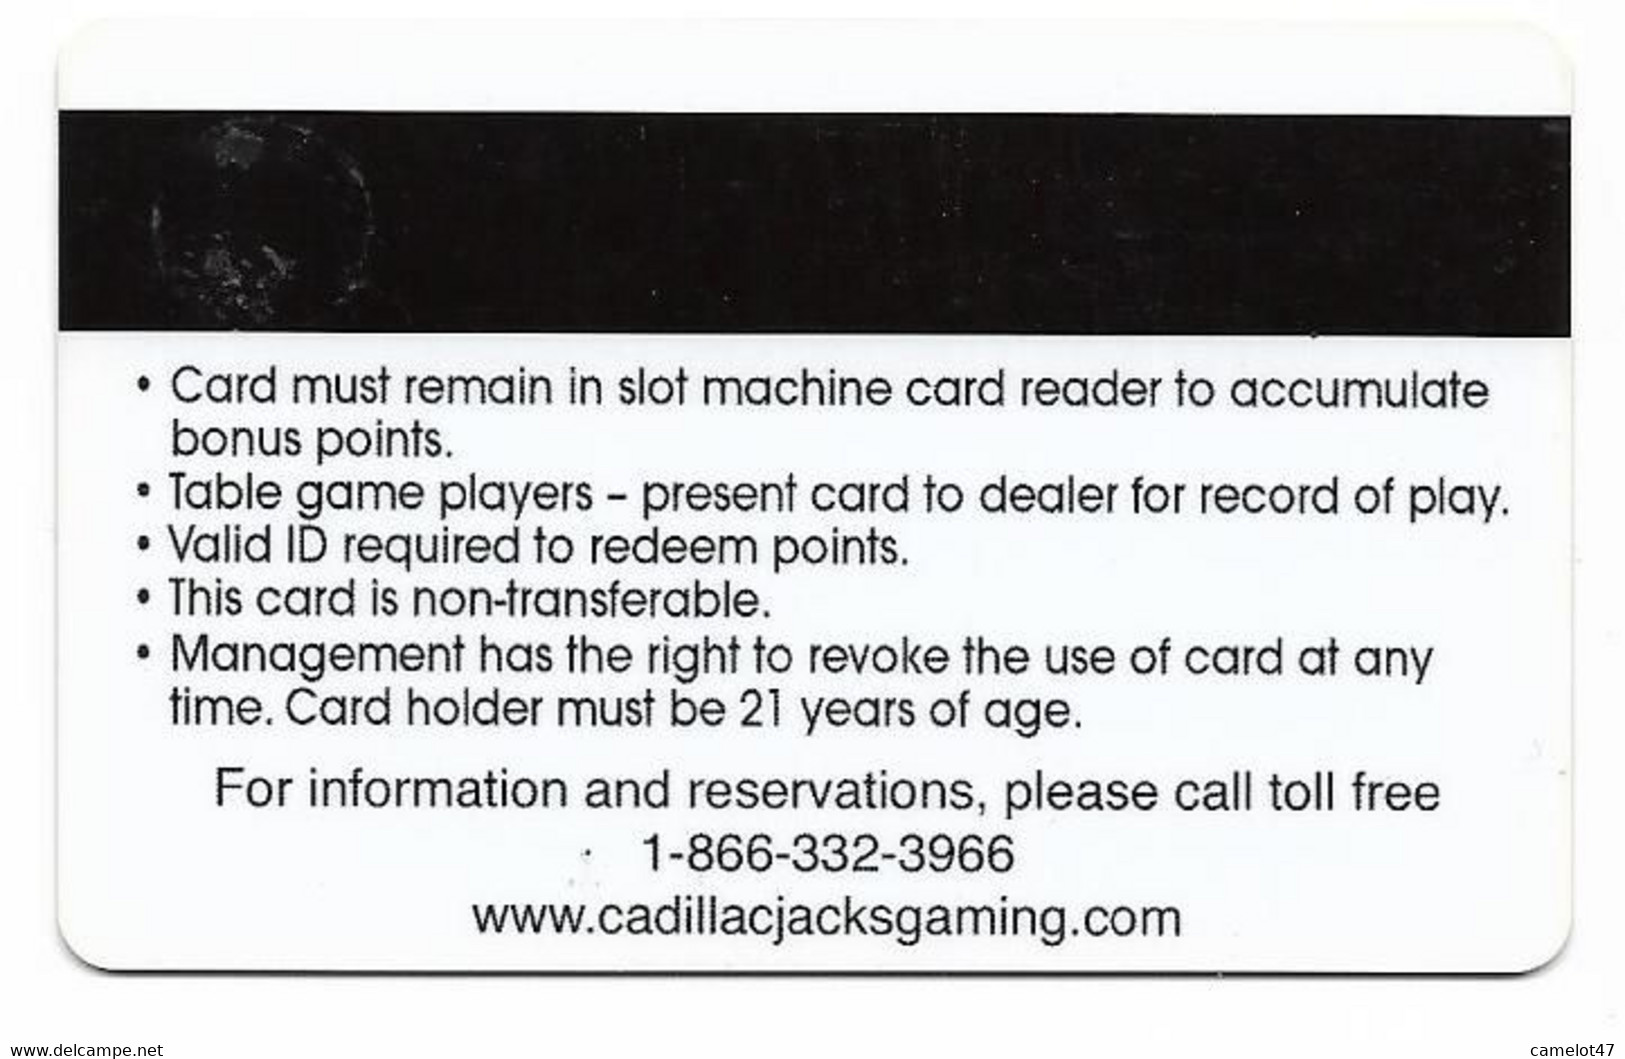 Cadillac Jack's Casino, Deadwood, SD, U.S.A. Older Used BLANK Slot Or Player's Card, # Cadillacjacks-1blank  BLANK CARD - Casino Cards